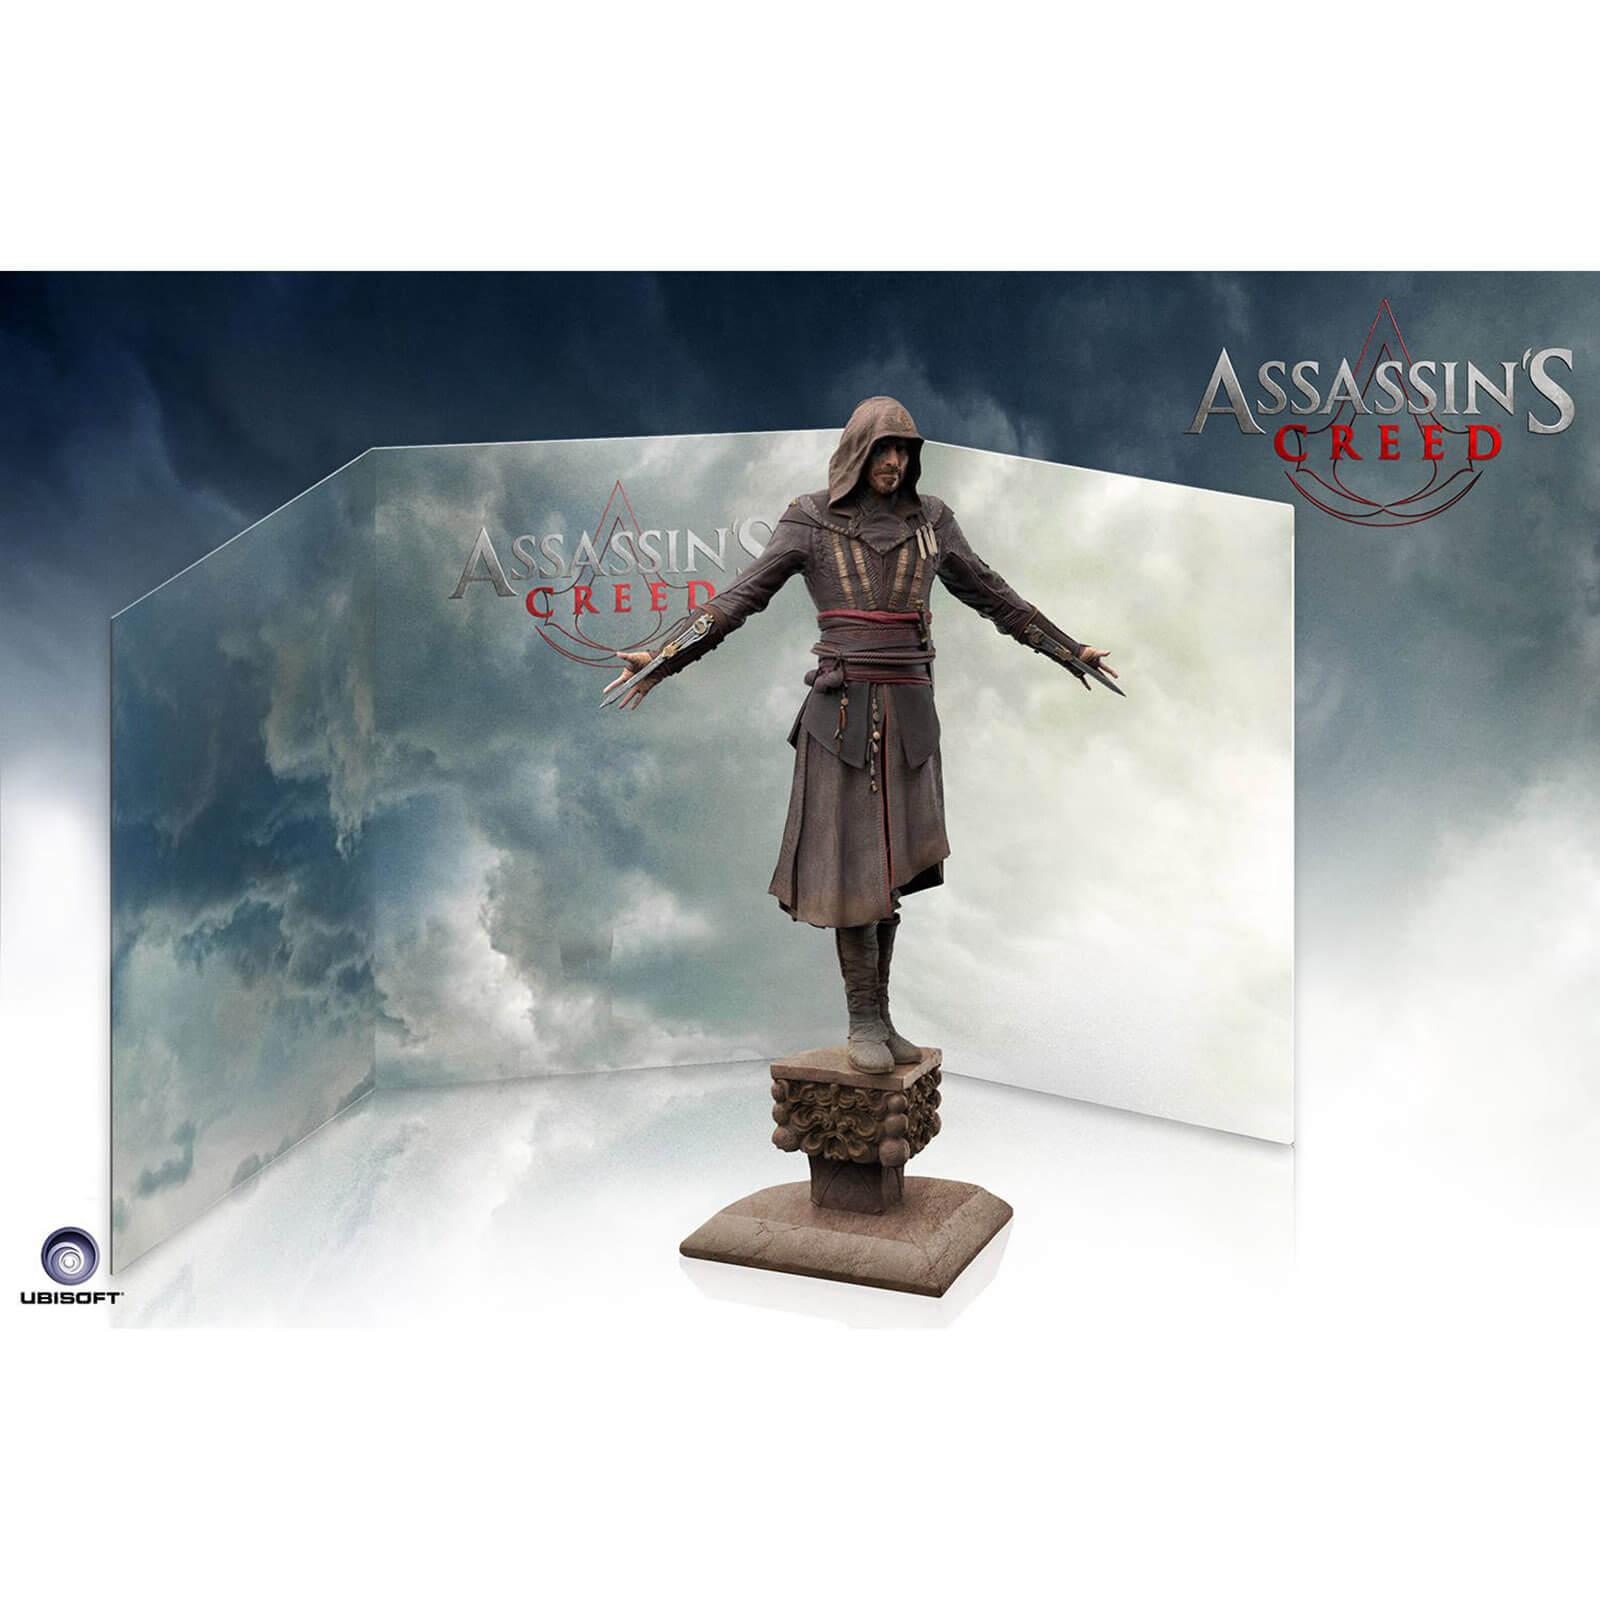 Assassin's Creed 35,5cm figure met 3 litho's